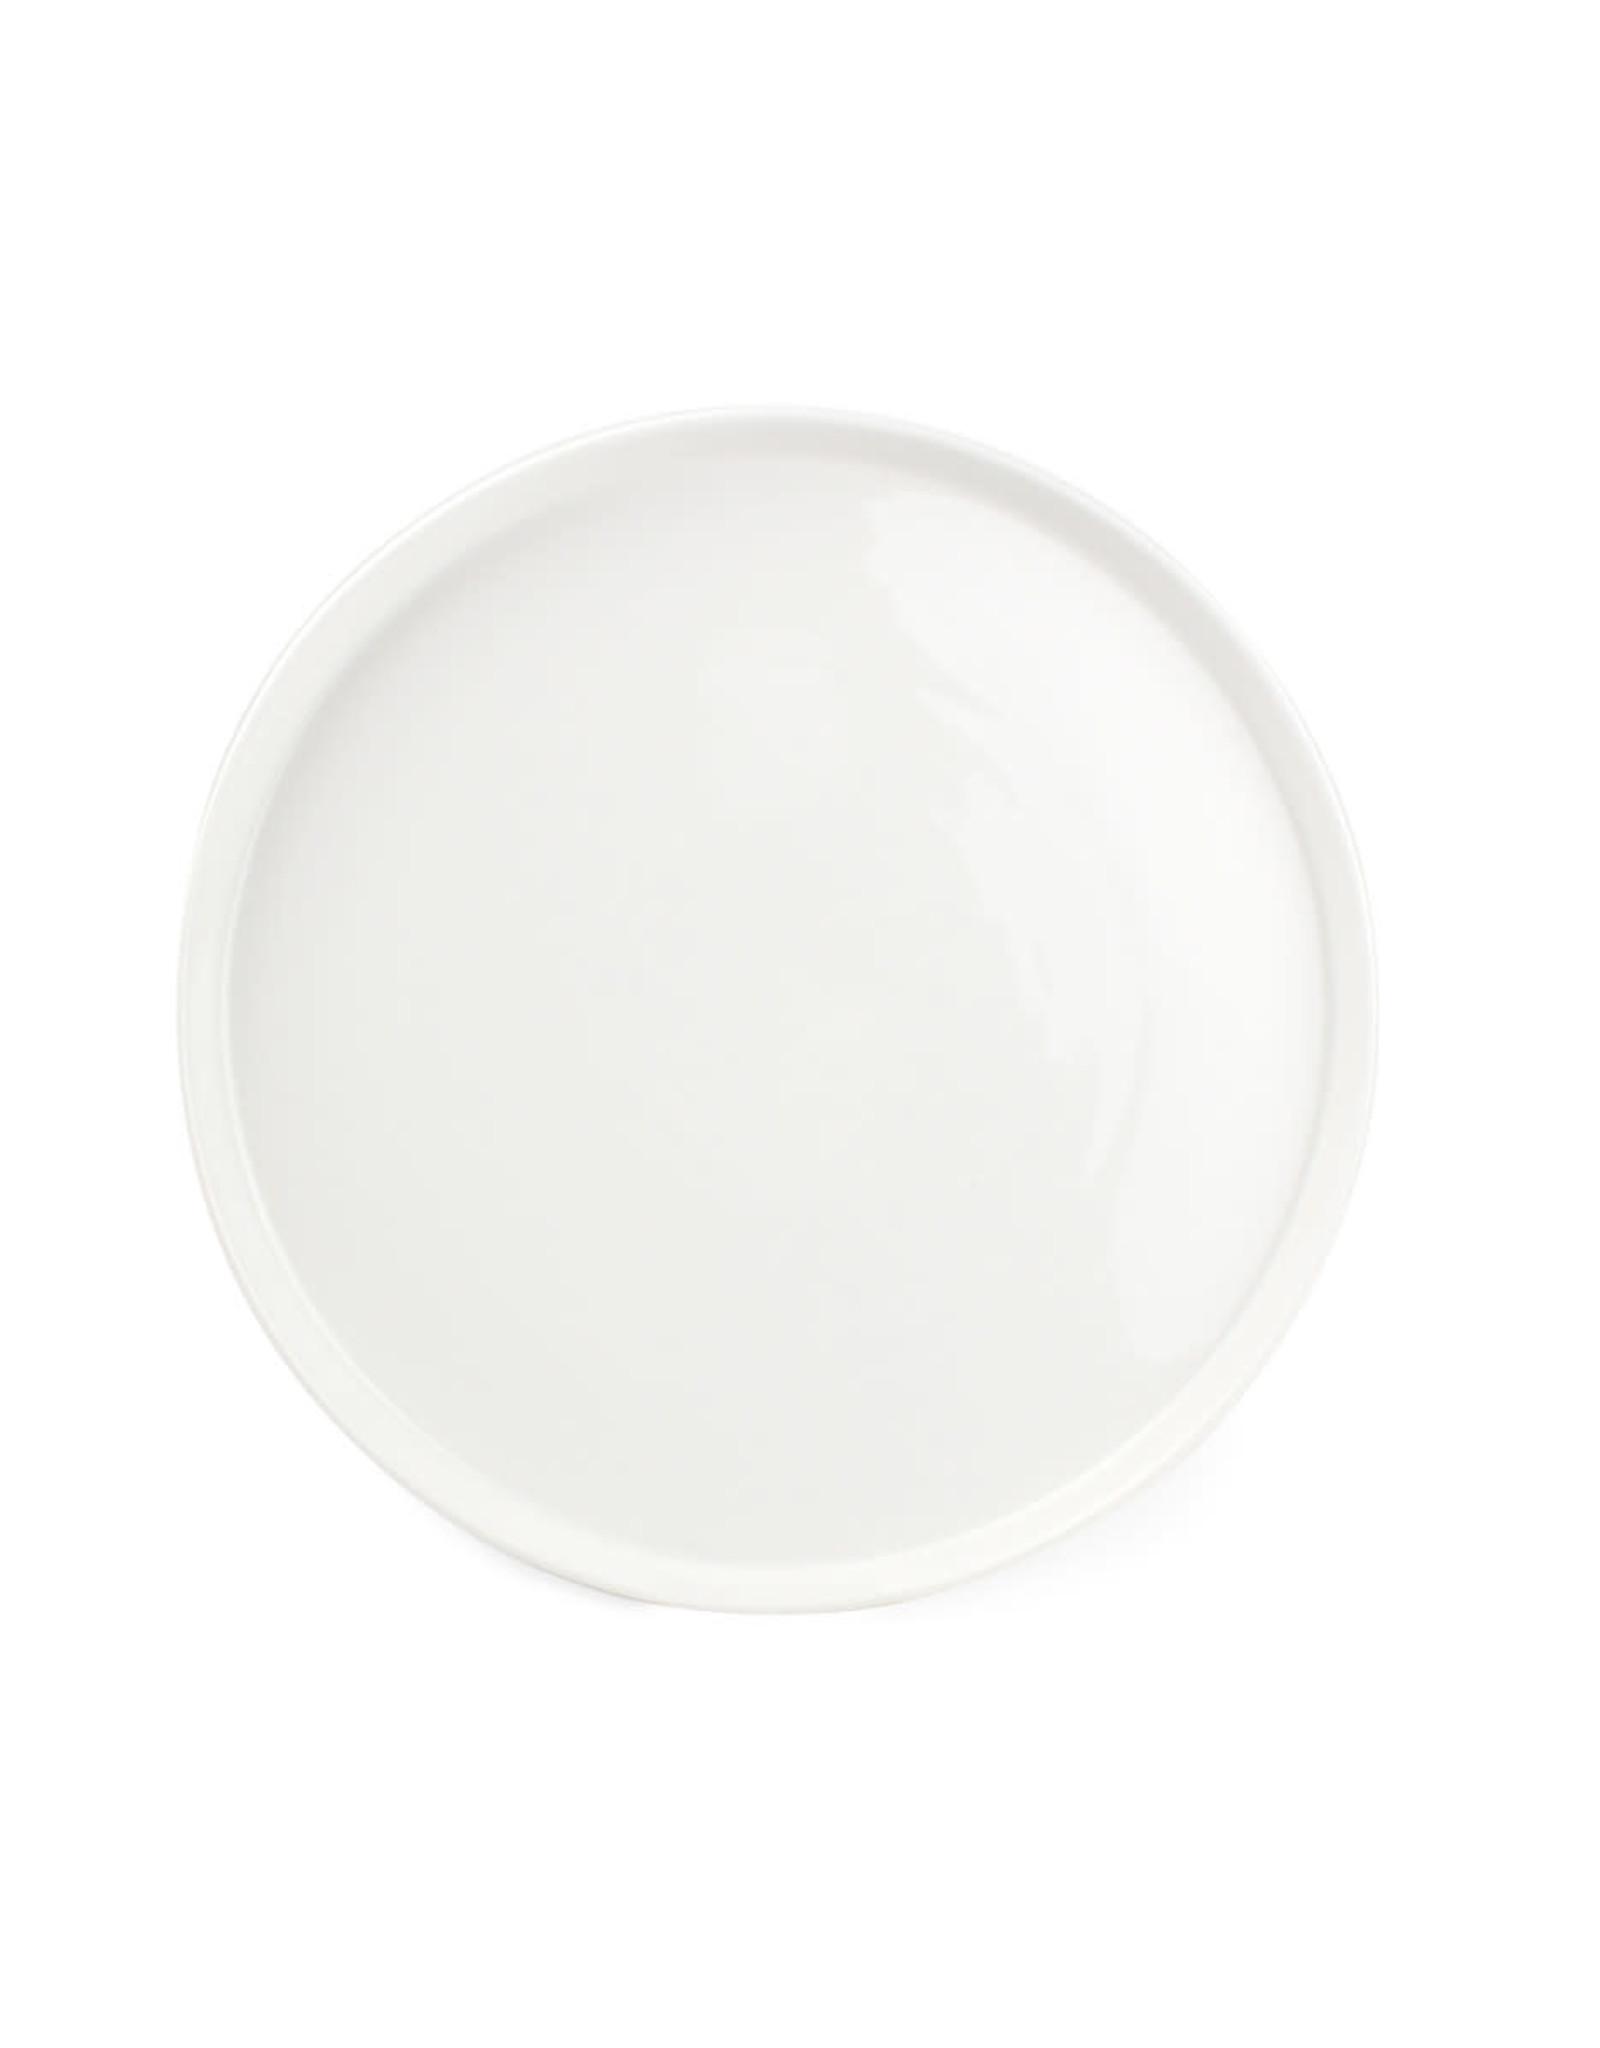 Bord Ø26,5 cm wit porselein met rand